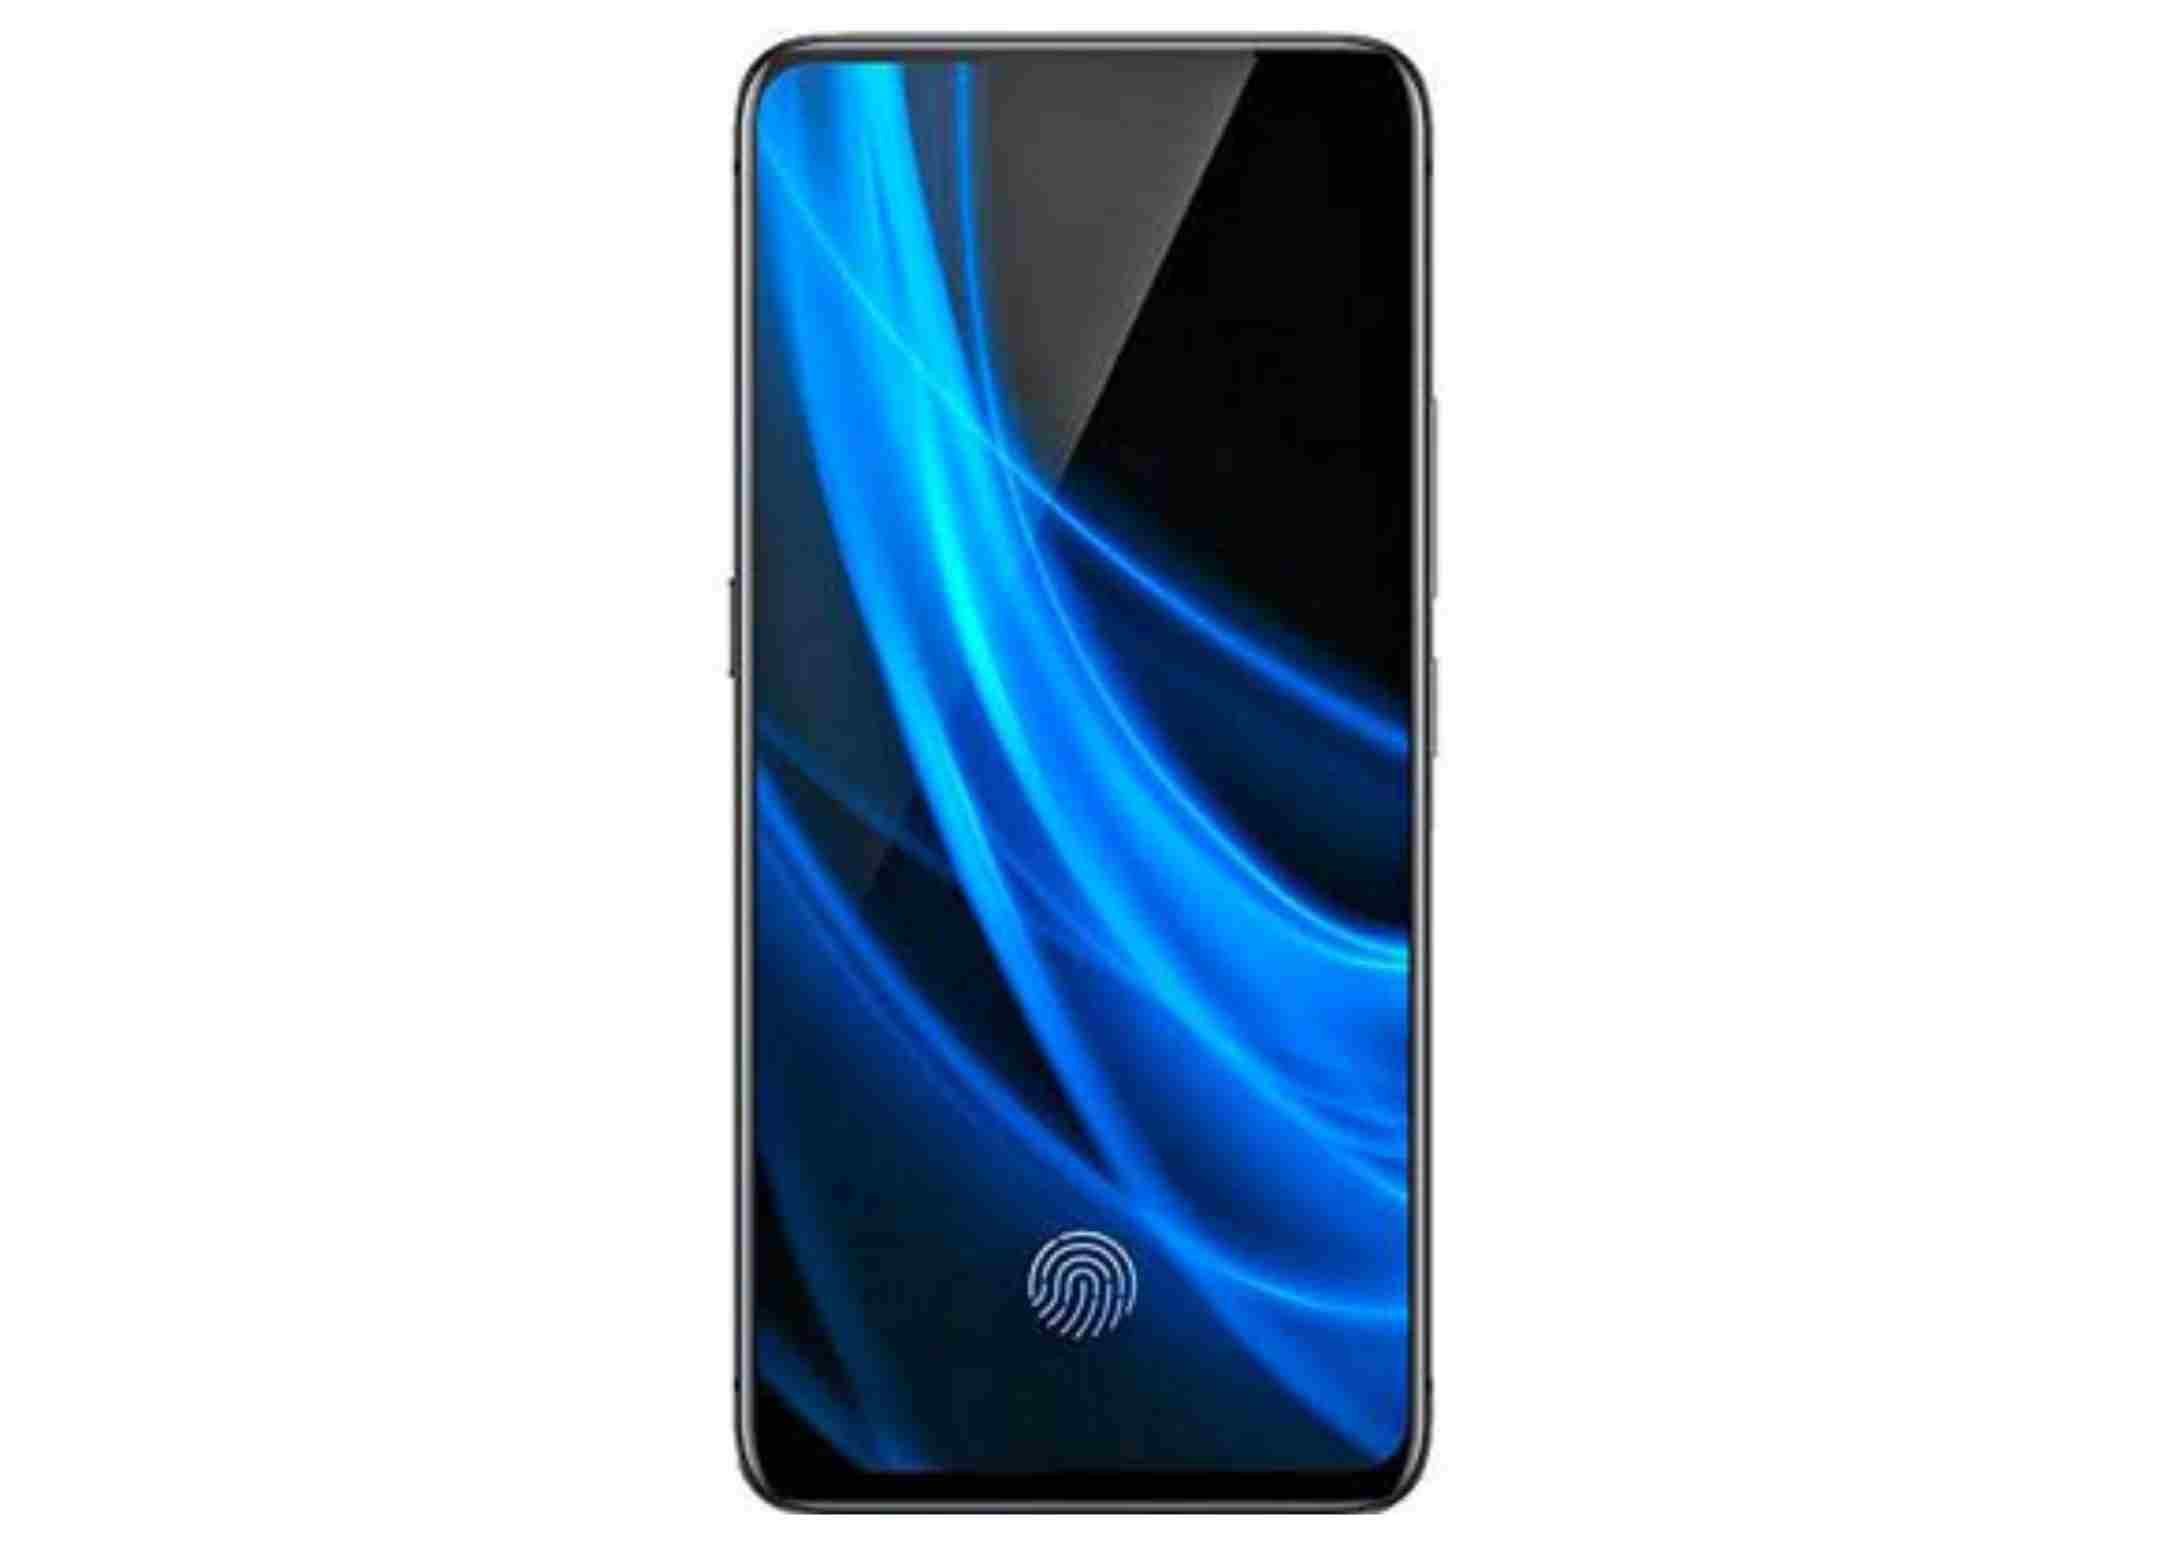 Vivo S3 Pro Expected Price, Release Date & Specs - My Mobiles